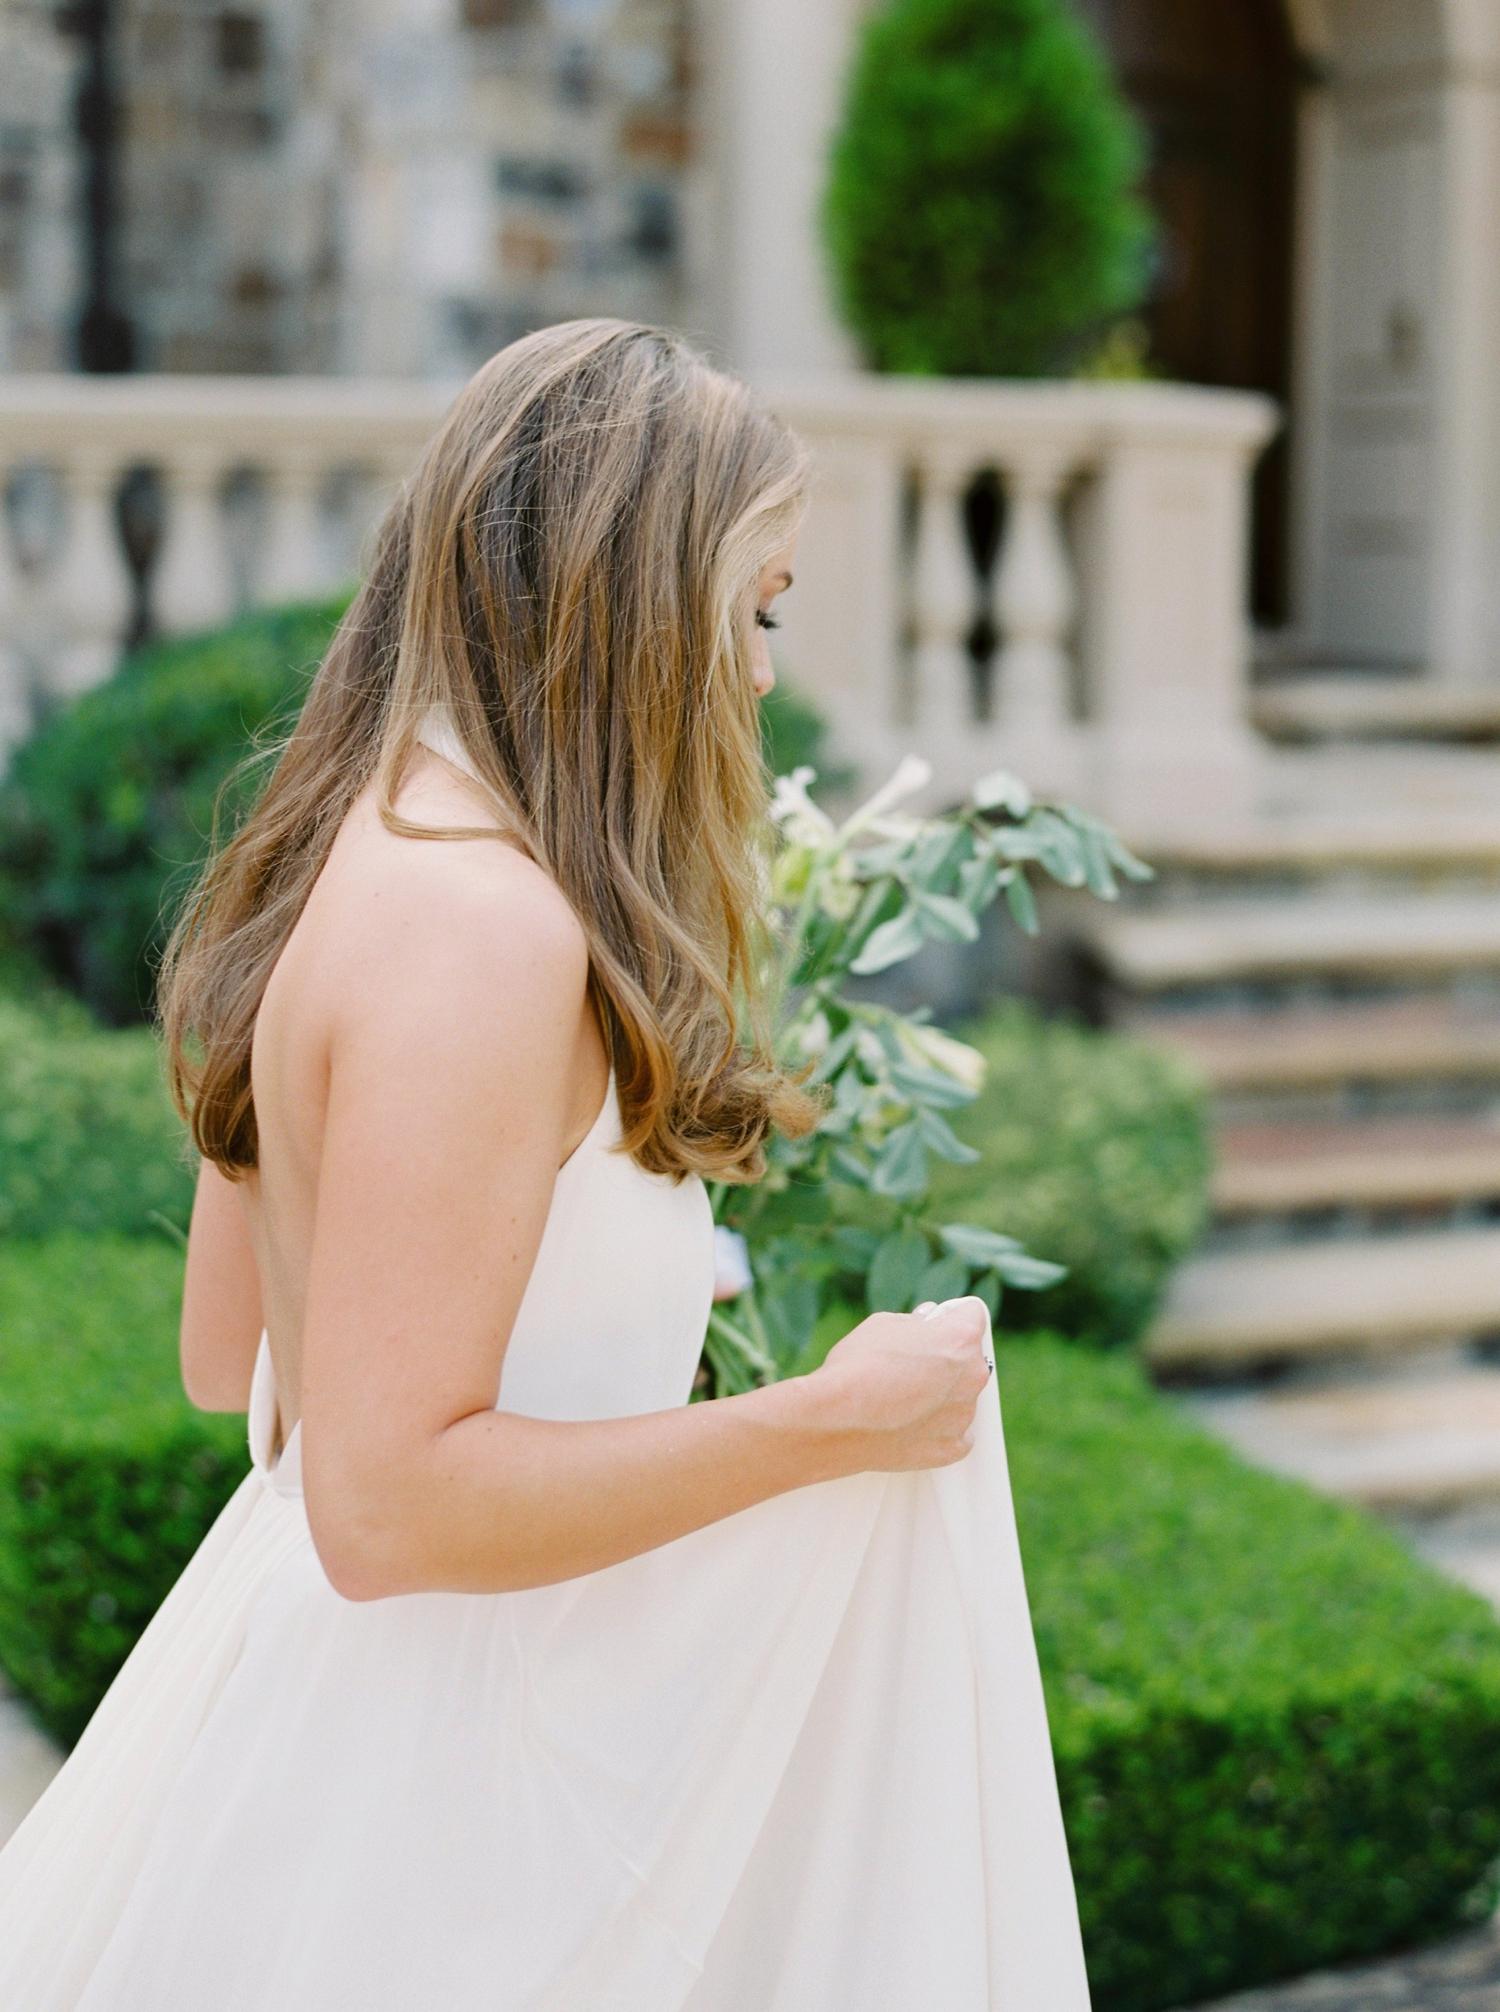 Calgary wedding photographers | georgia wedding photographers | fine art film | Justine Milton Photography | georgia wedding | pastel bouquet | pastel wedding | wedding dress